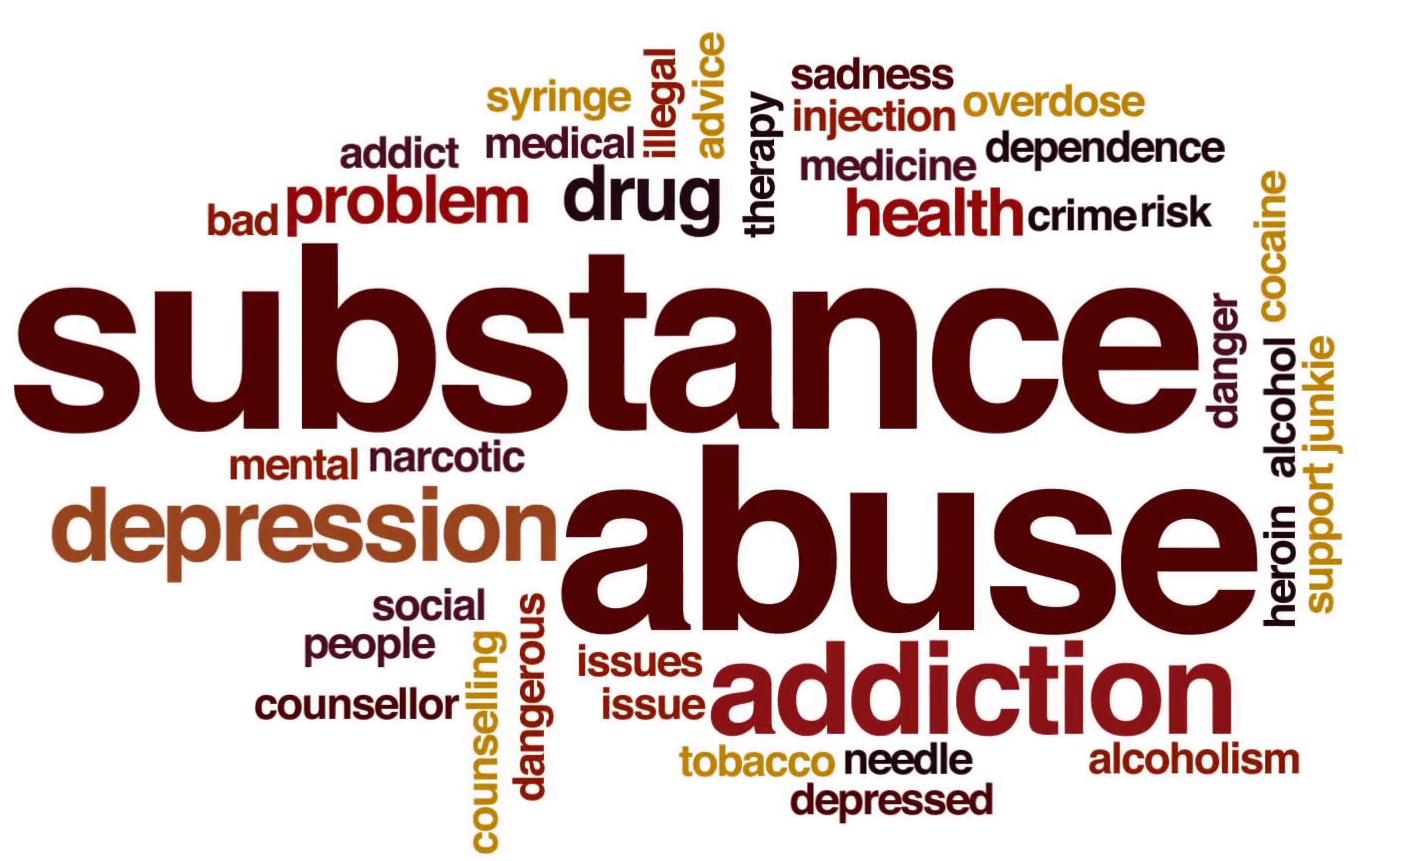 substance-abuse-animated-word-cloud-text-design-animation_spzavyude_thumbnail-full08.png